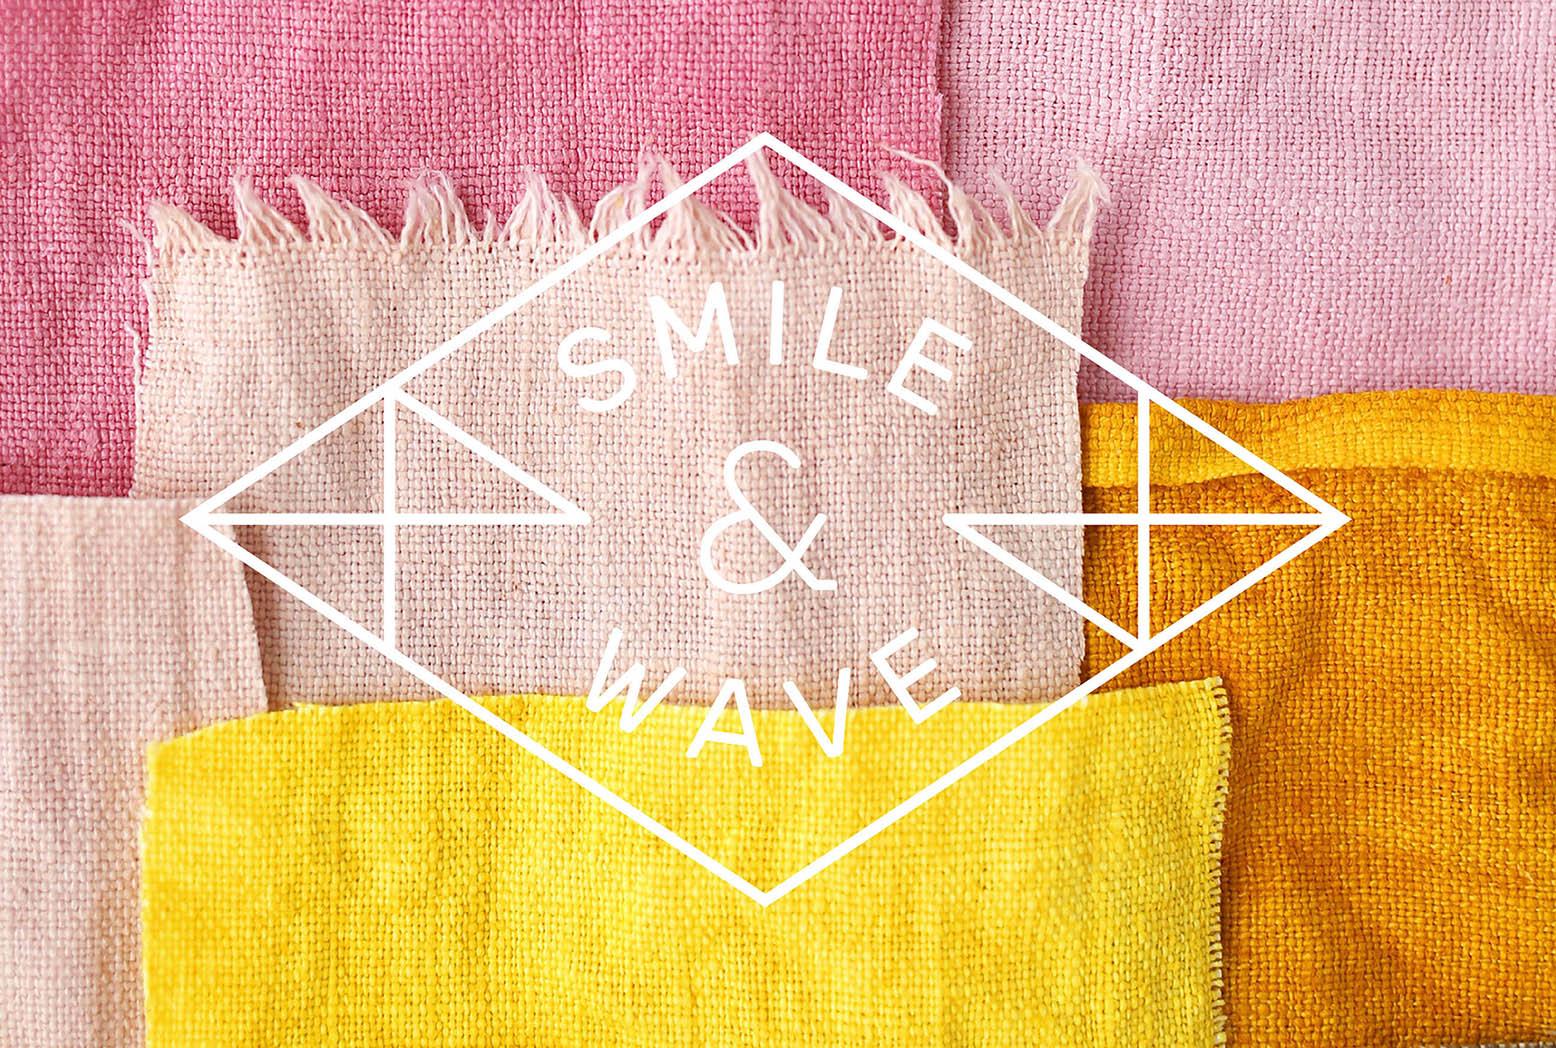 SmileAndWave-logo-branding-fabric-Mara-Dawn.jpg